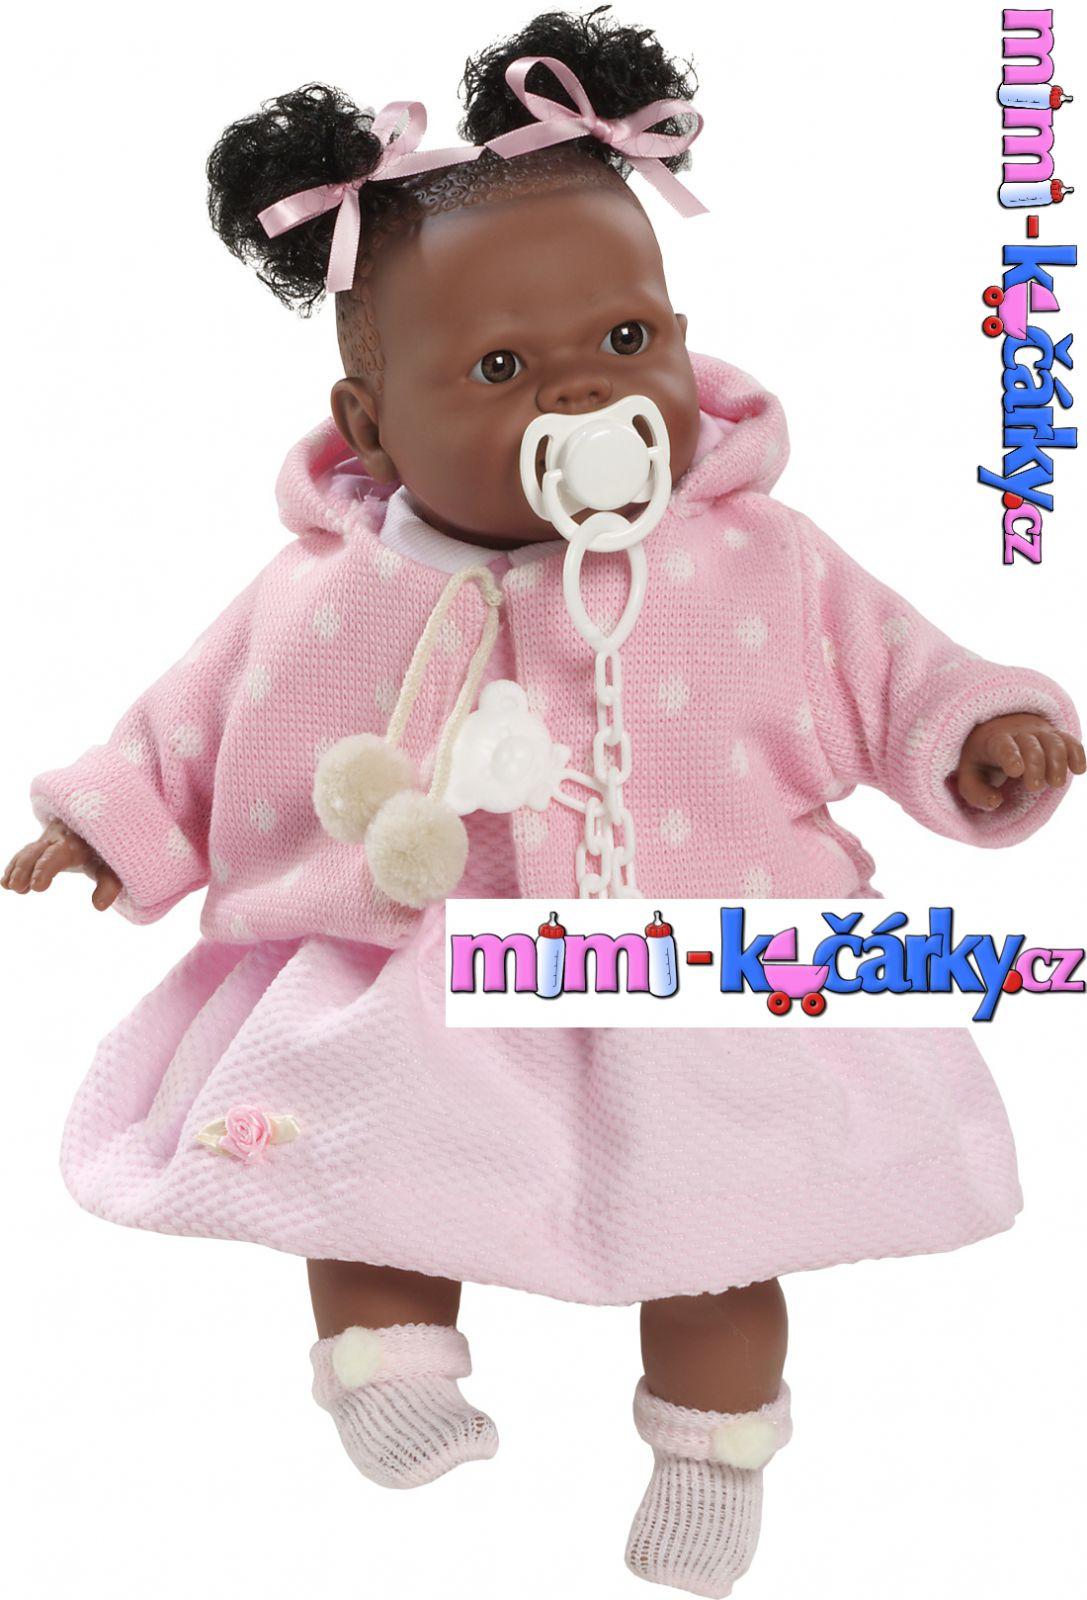 Mluvící realistická panenka černoška Berbesa Alice 42cm